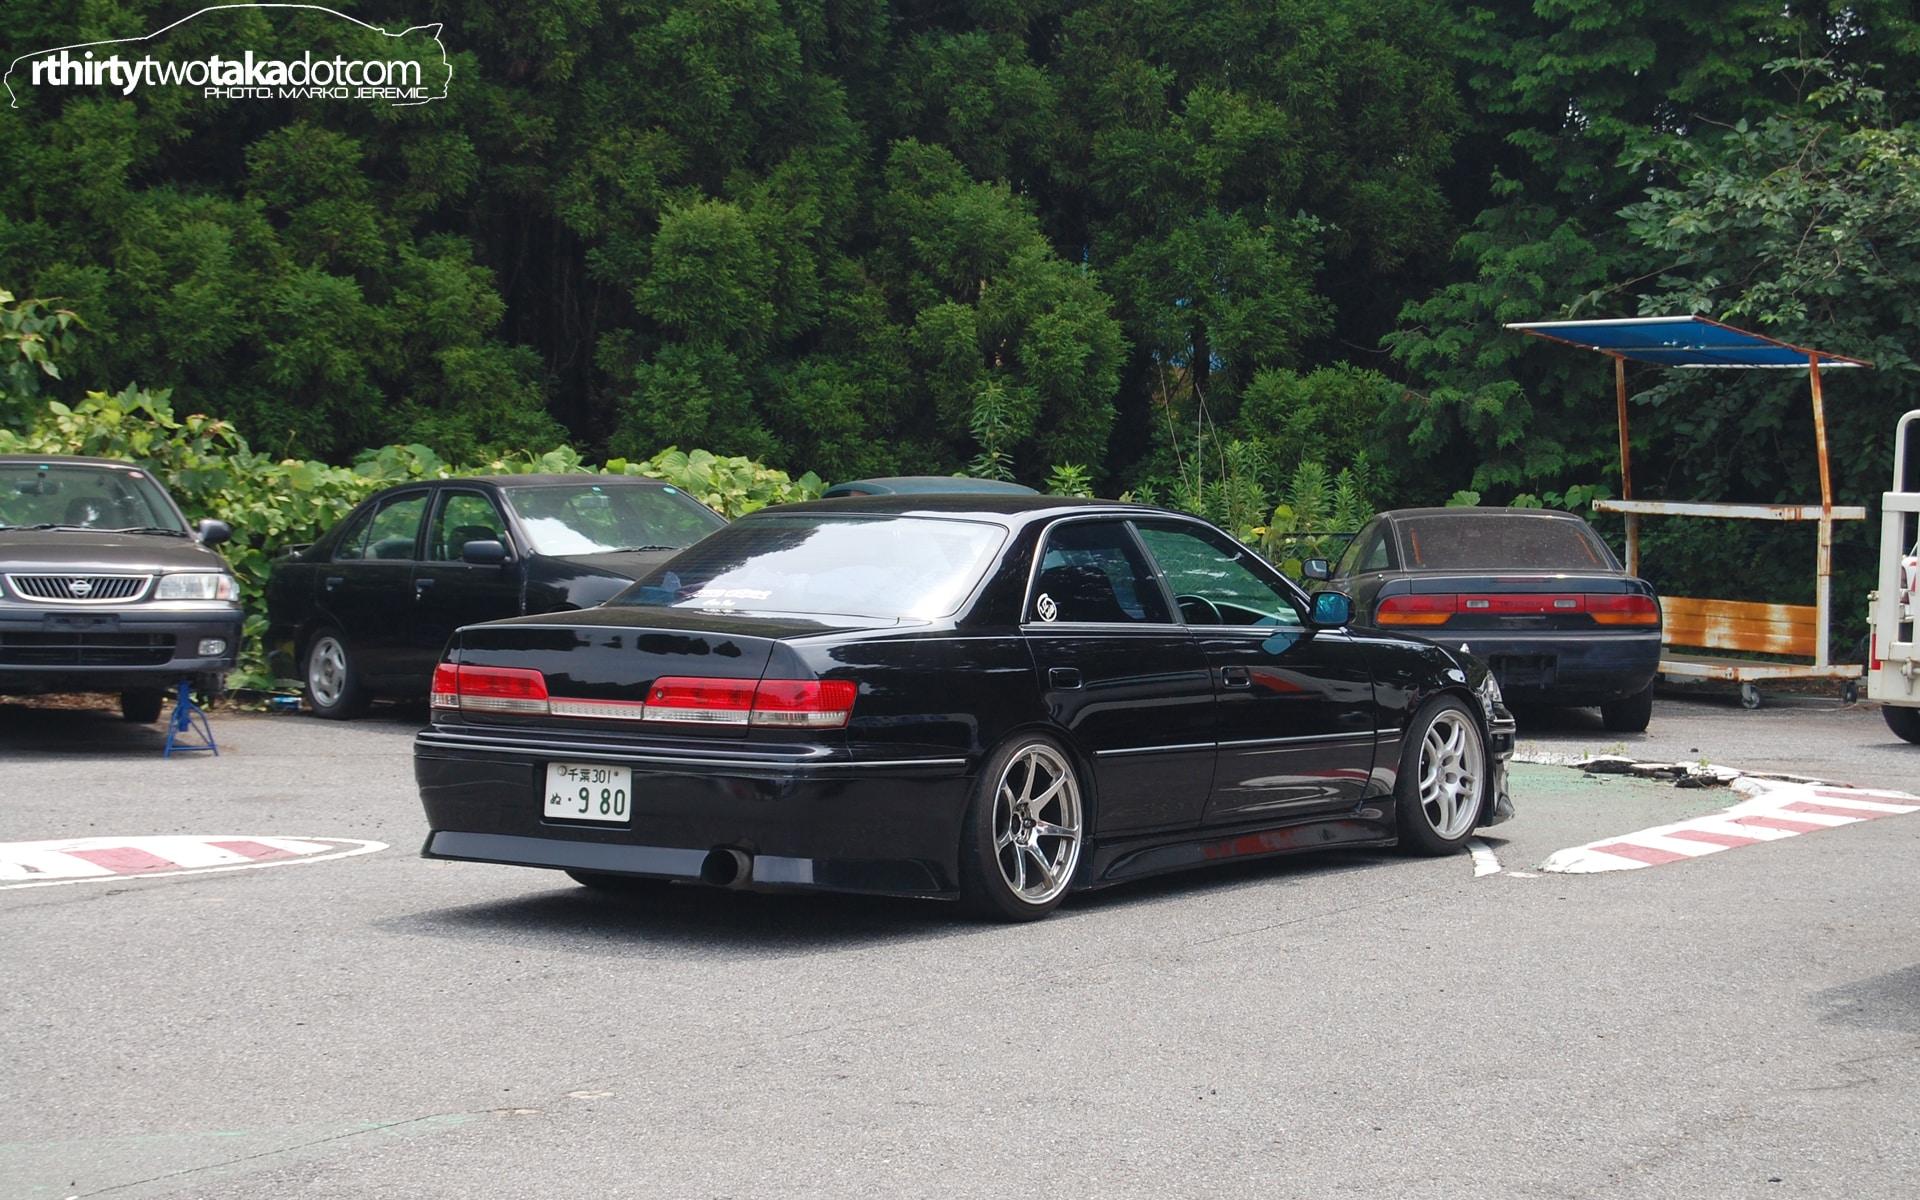 Toyota Mark II JZX100 Source r32taka.com